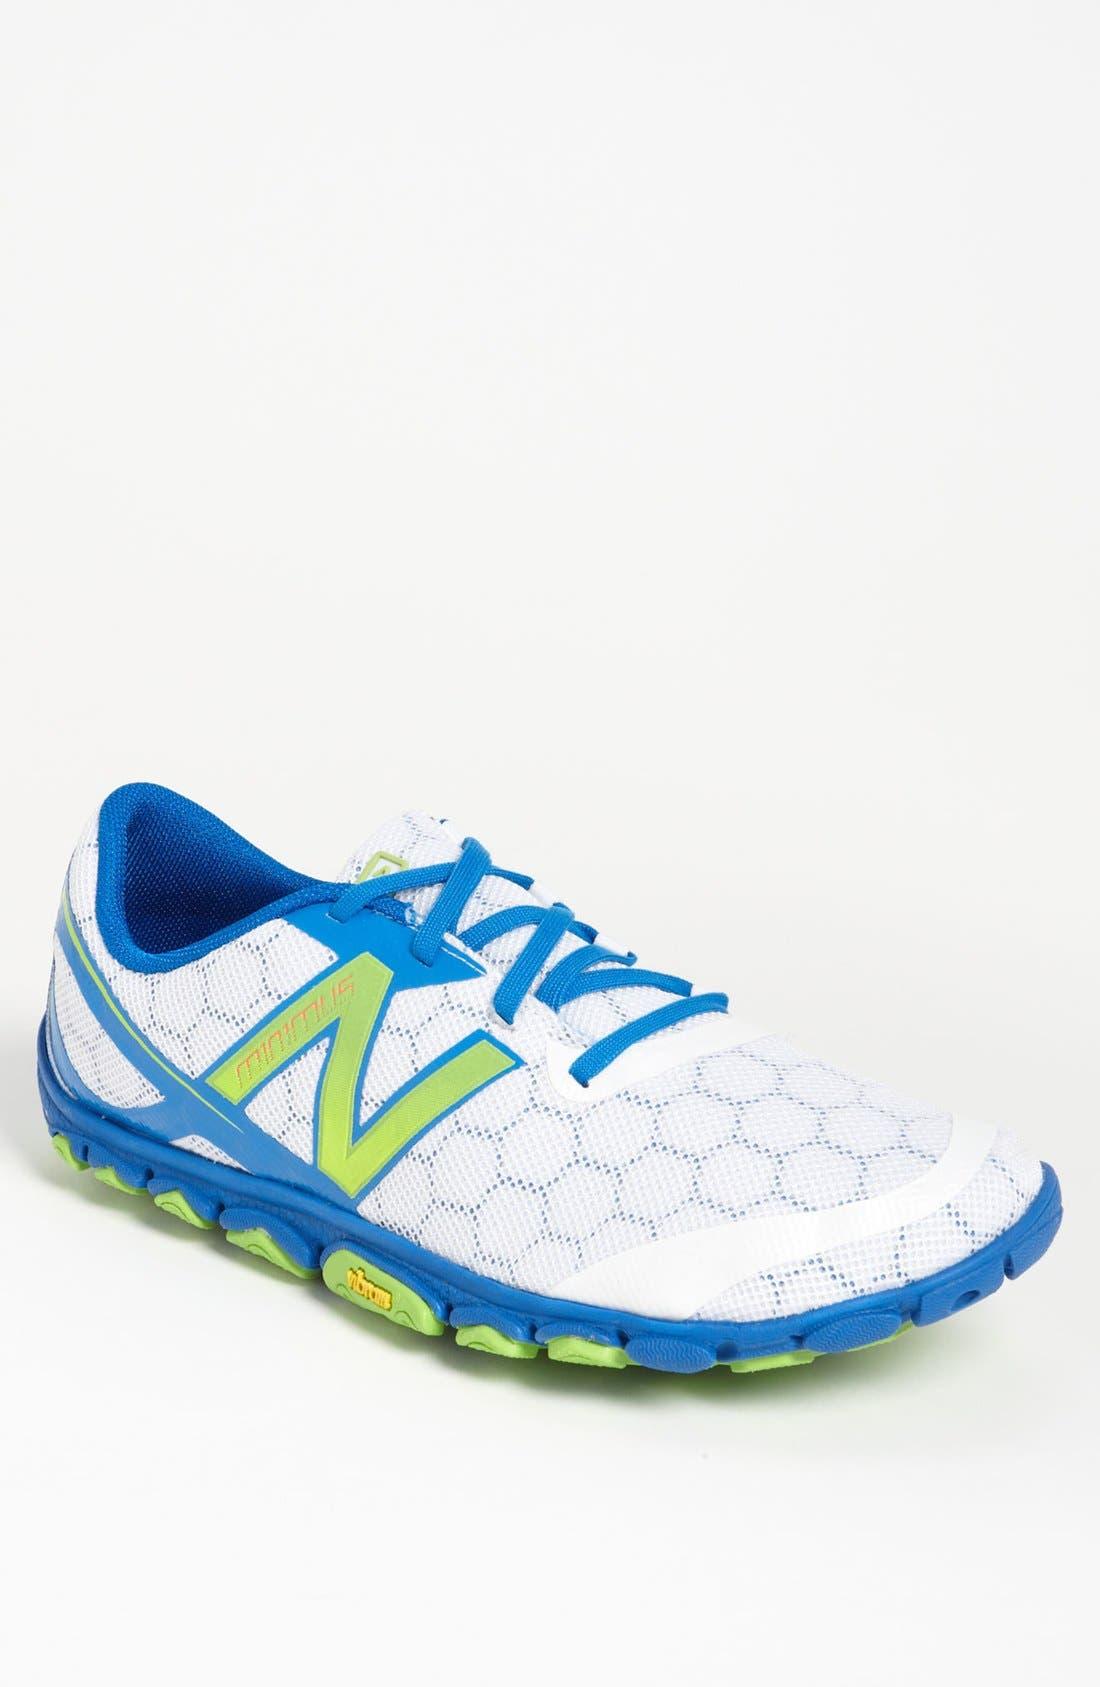 Alternate Image 1 Selected - New Balance 'MR10' Running Shoe (Men)